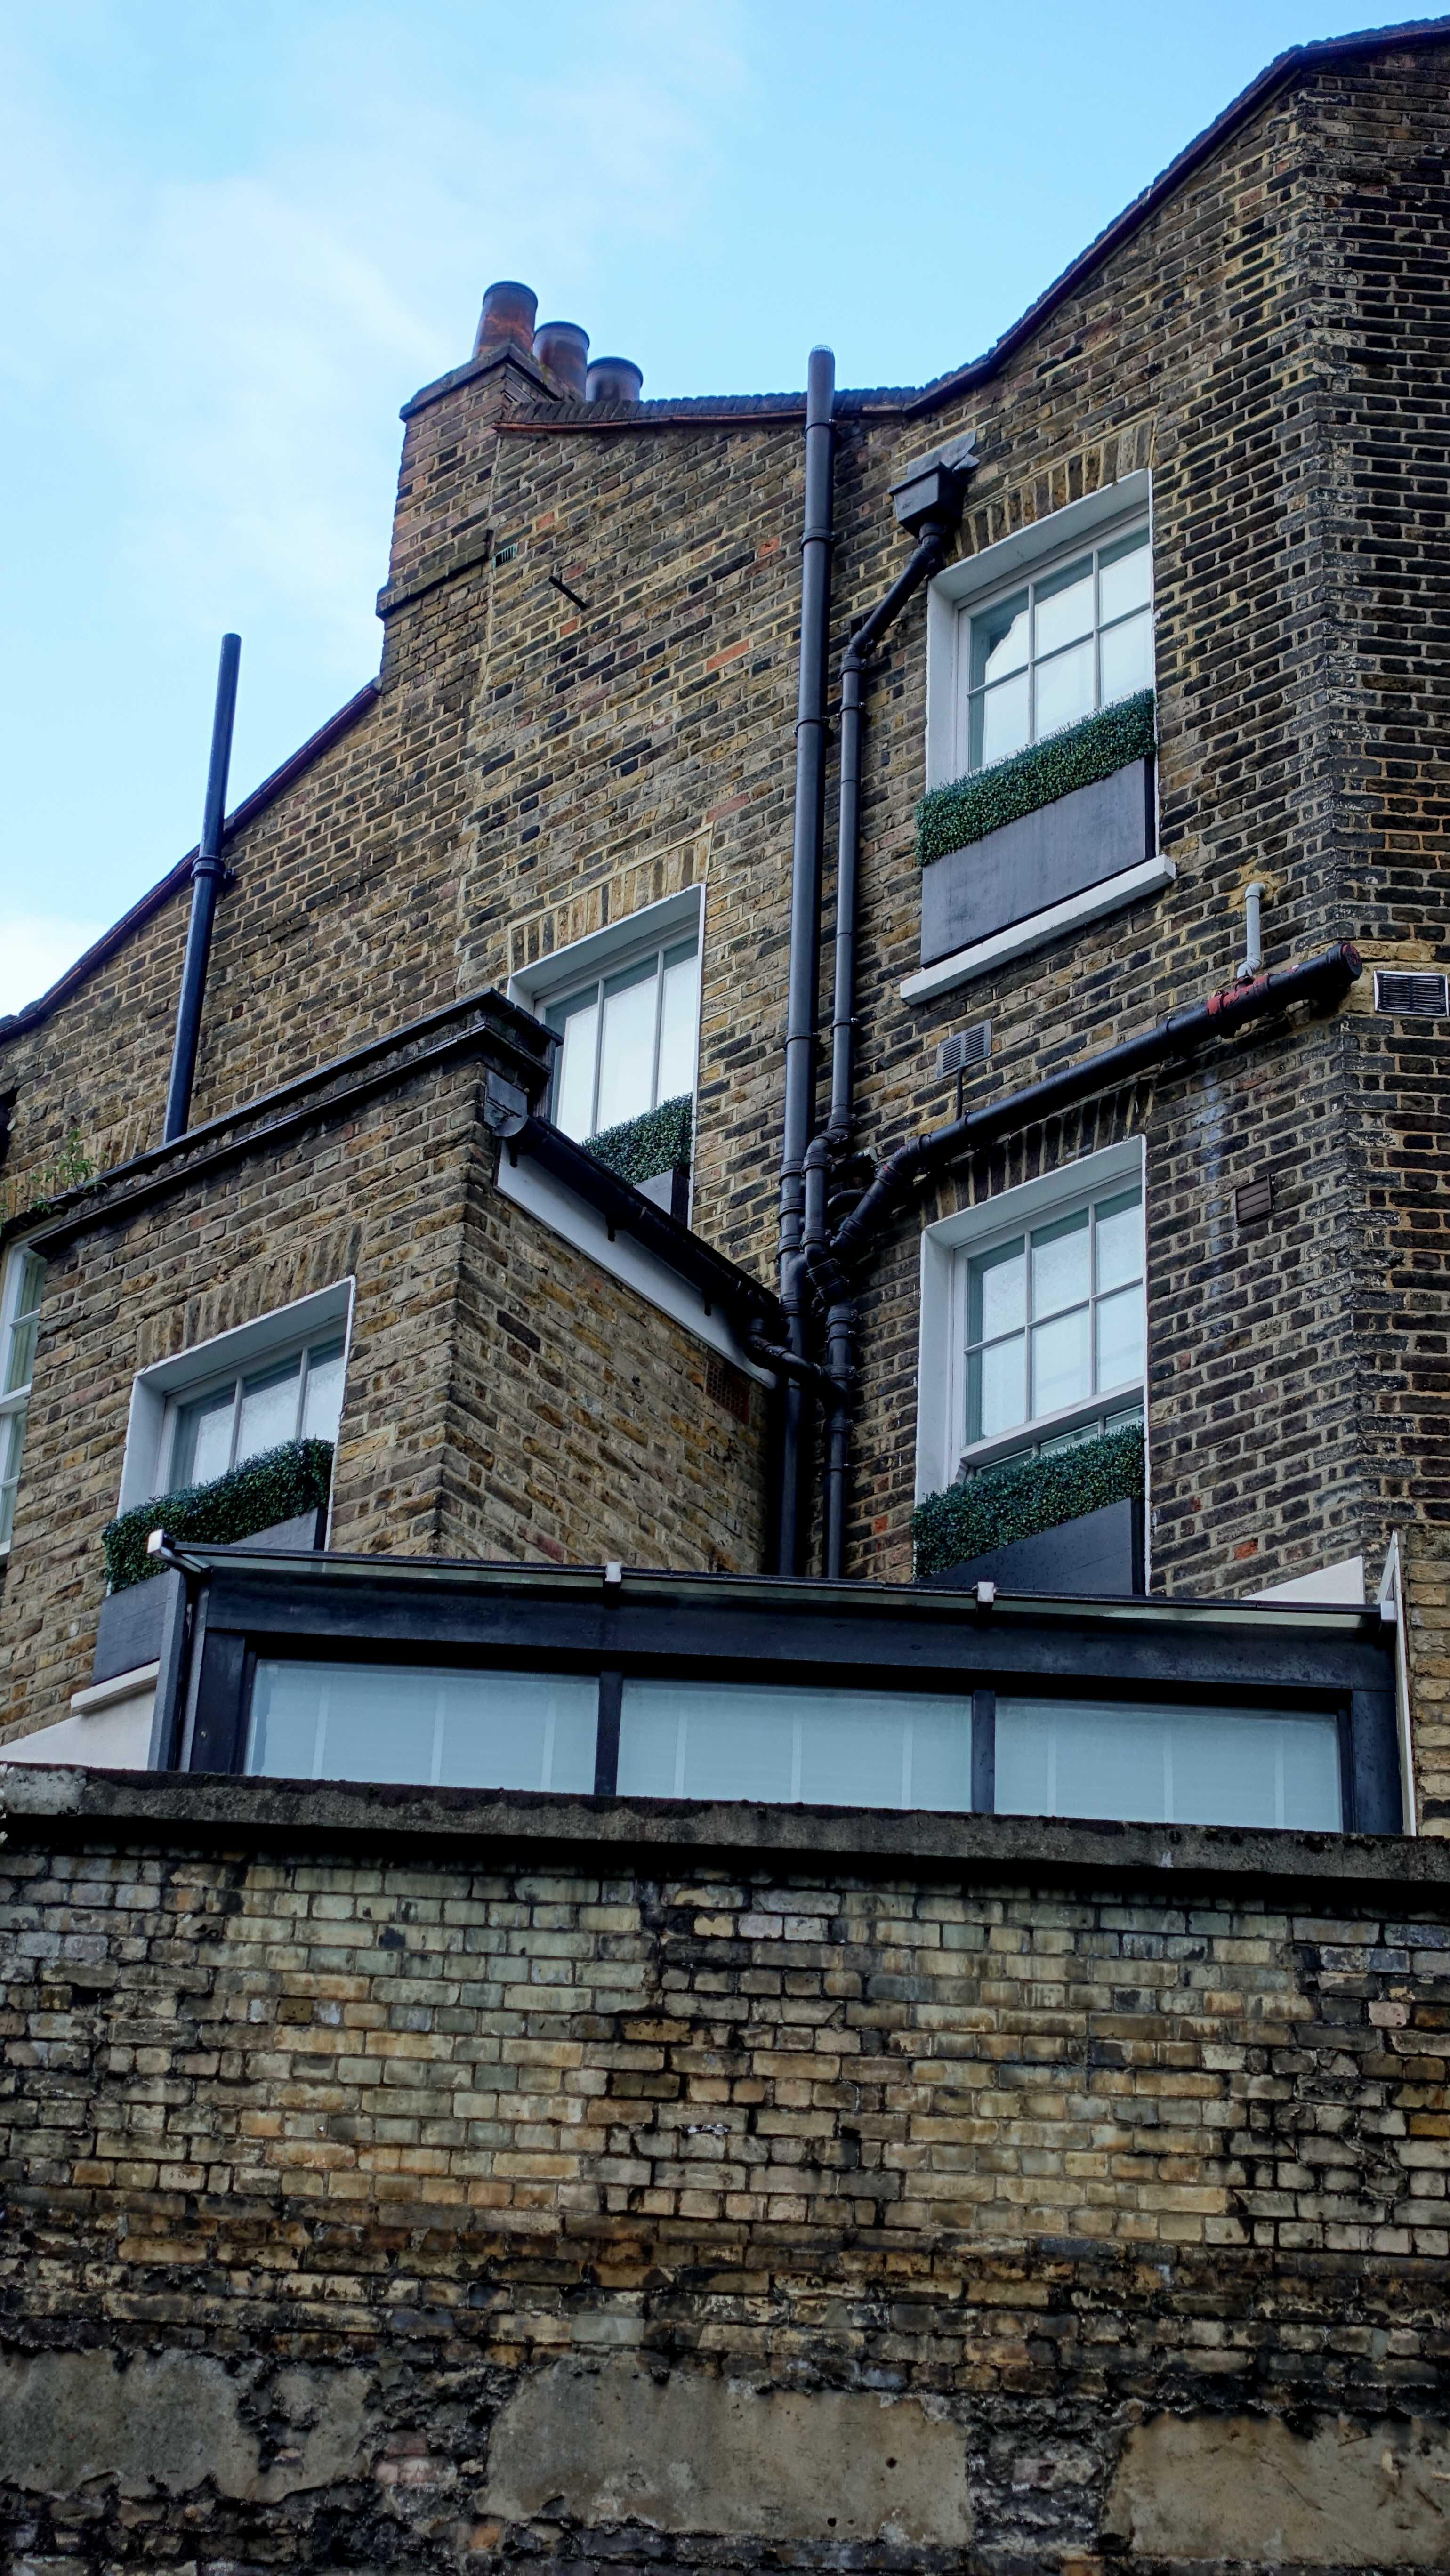 Free stock photo of brick wall, brickwall, hedge, old window